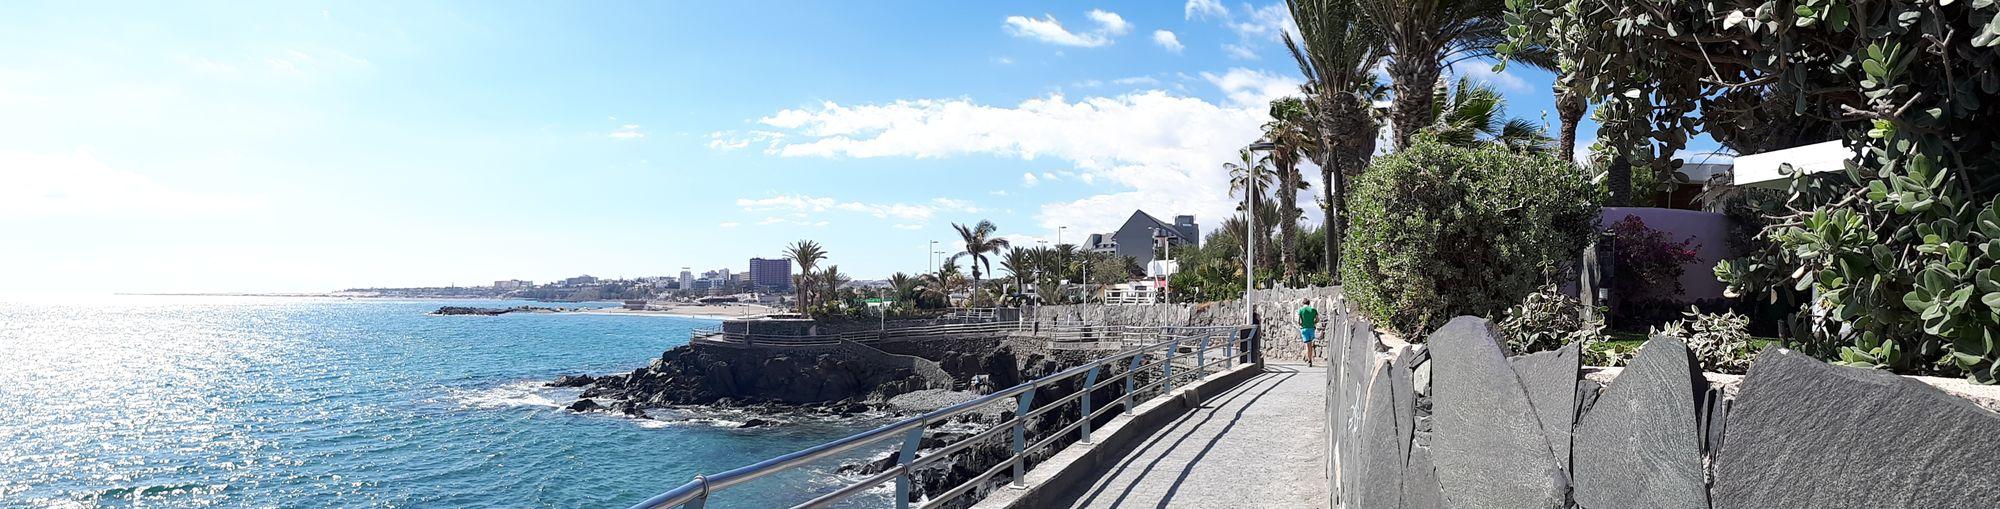 Playa De Las Burras Gran Canaria Panorama Panoramic Outdoors Sea